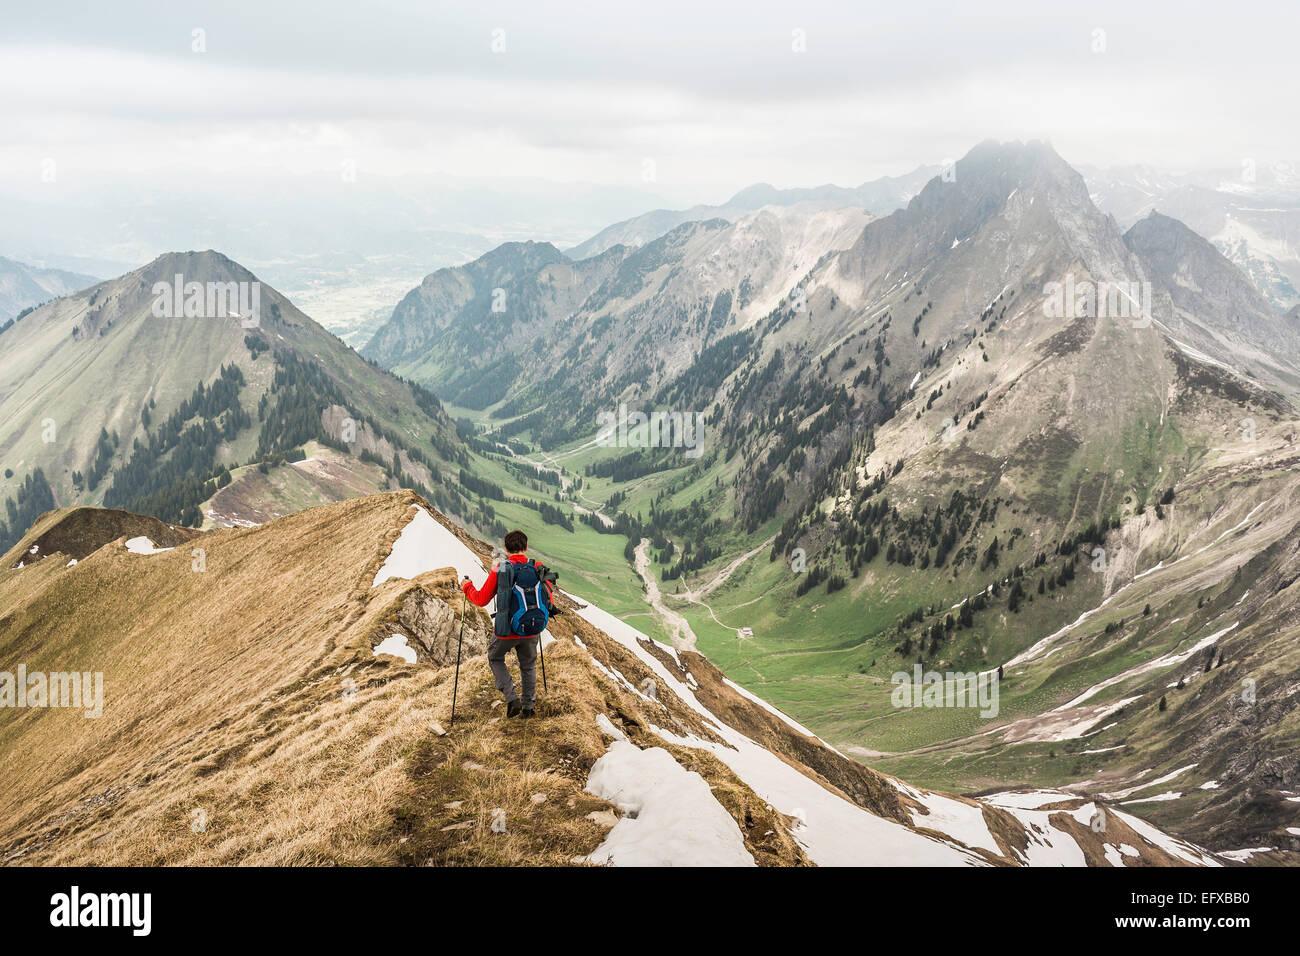 Young man mountain trekking down ridge in Bavarian Alps, Oberstdorf, Bavaria, Germany - Stock Image